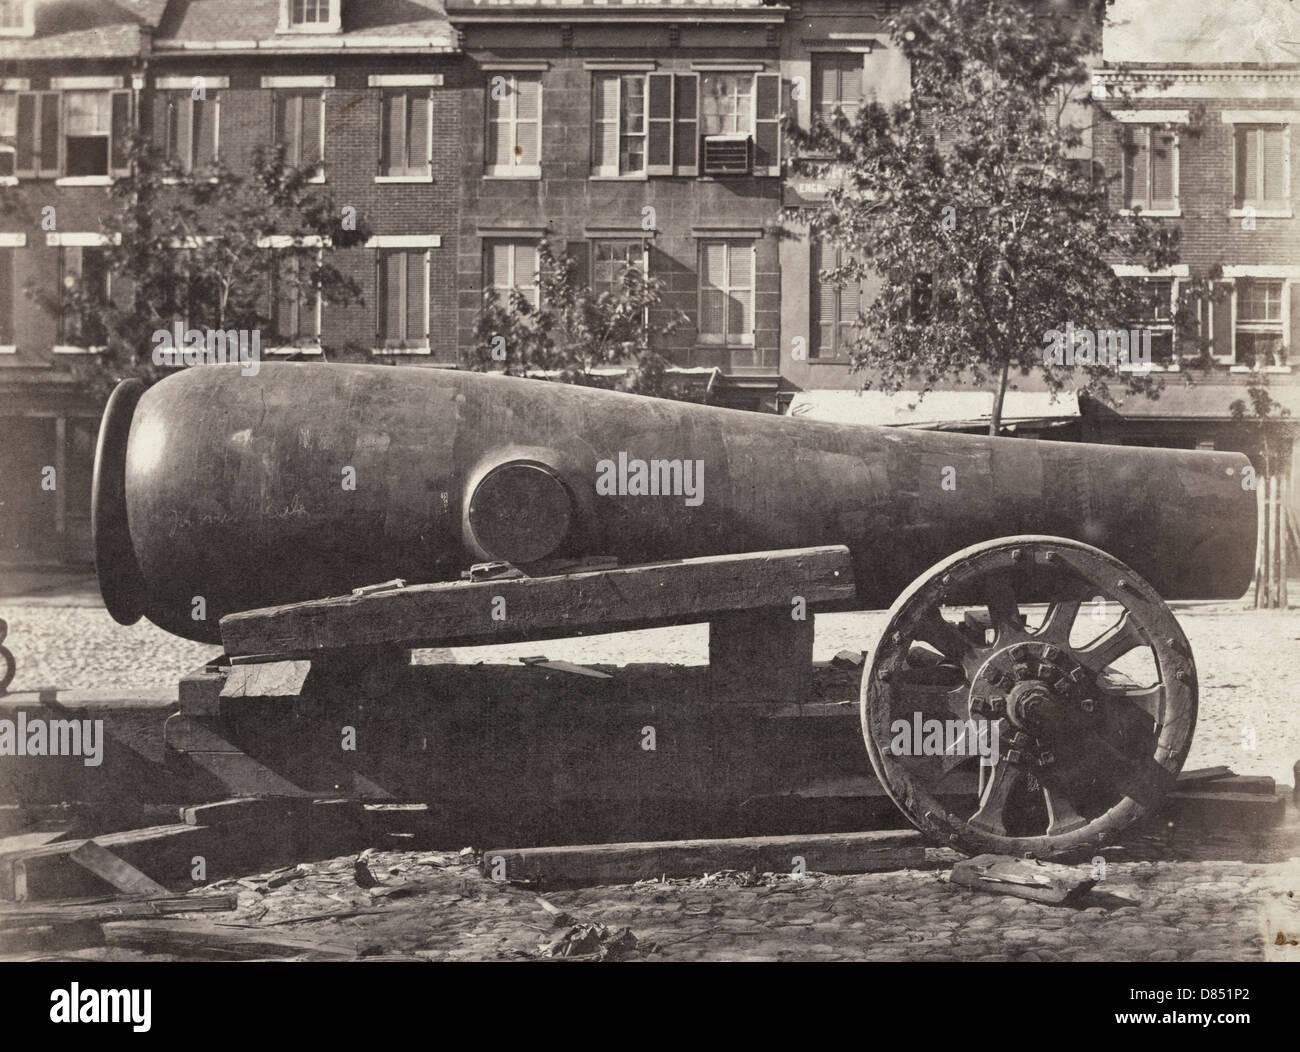 The 'Floyyd' gun: 15 inch, range 6 miles. A cannon called The Floyyd [i.e., Floyd] Gun, circa 1863 - Stock Image